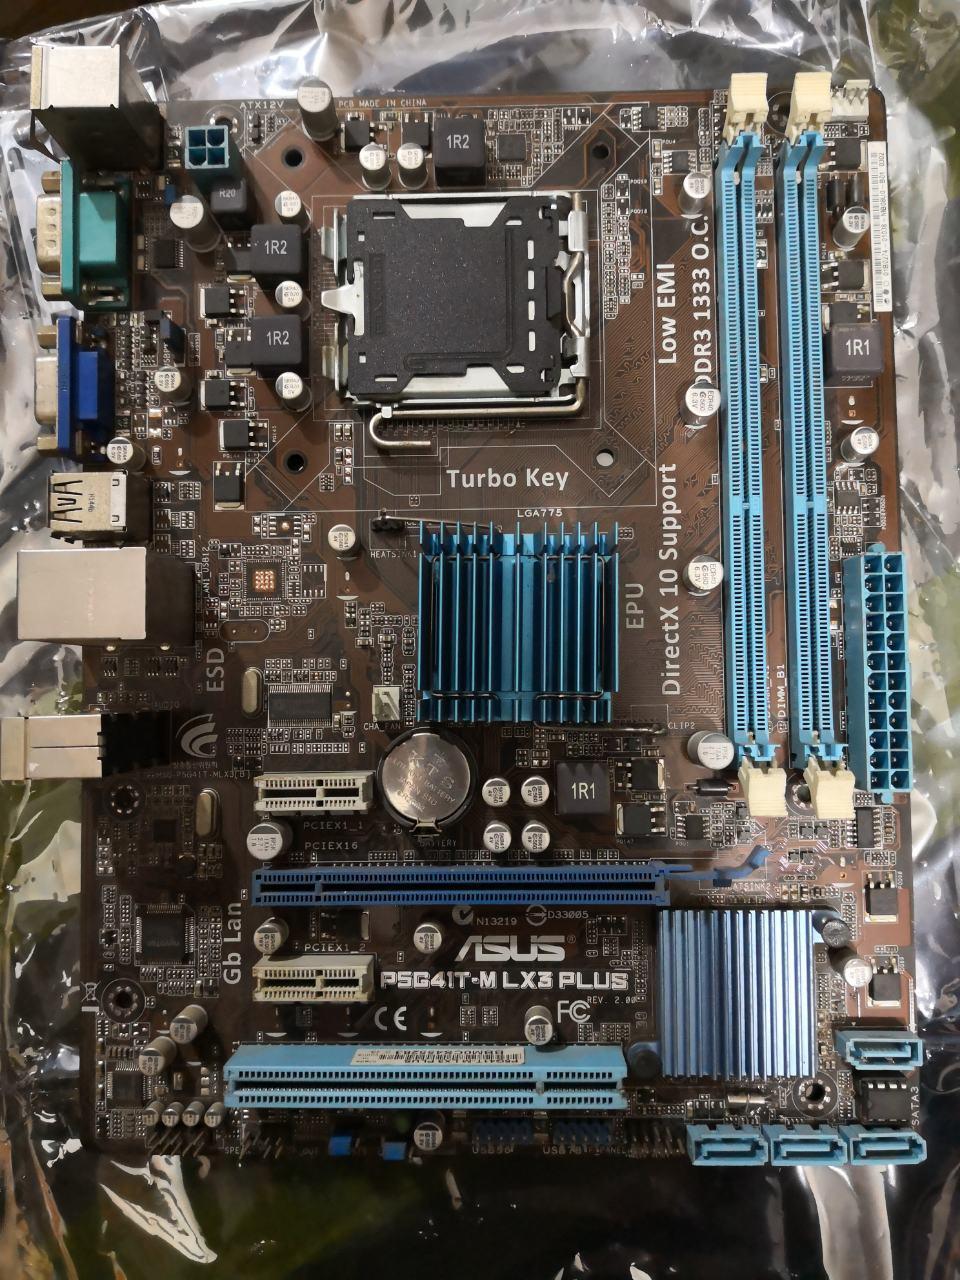 Материнская плата ASUS P5G41T-M LX3 PLUS Intel G41, s775 б/у